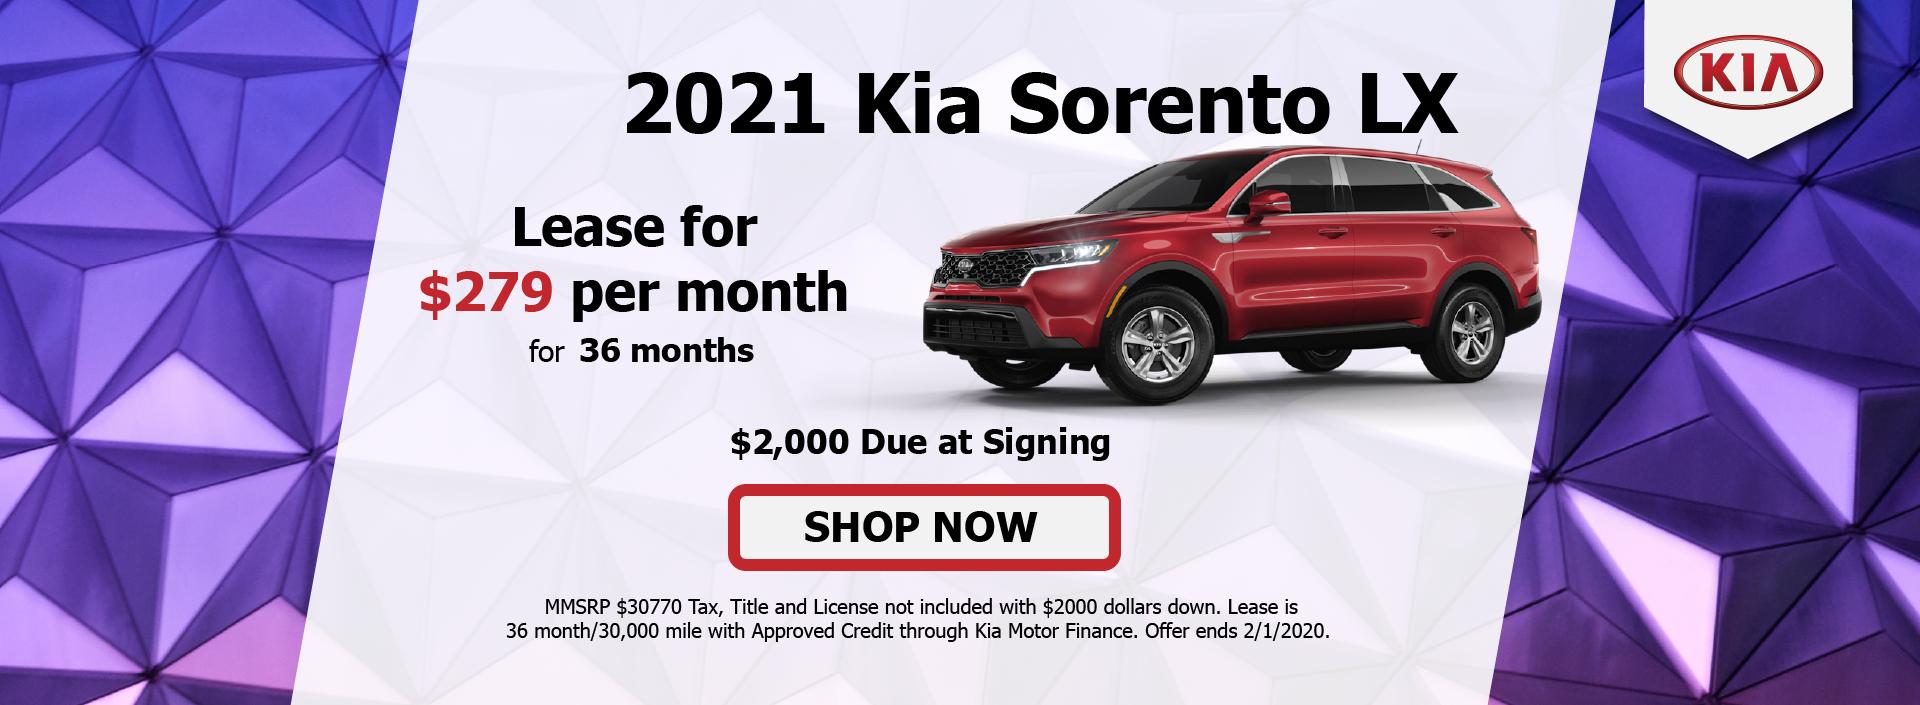 2021 Kia Sorento January